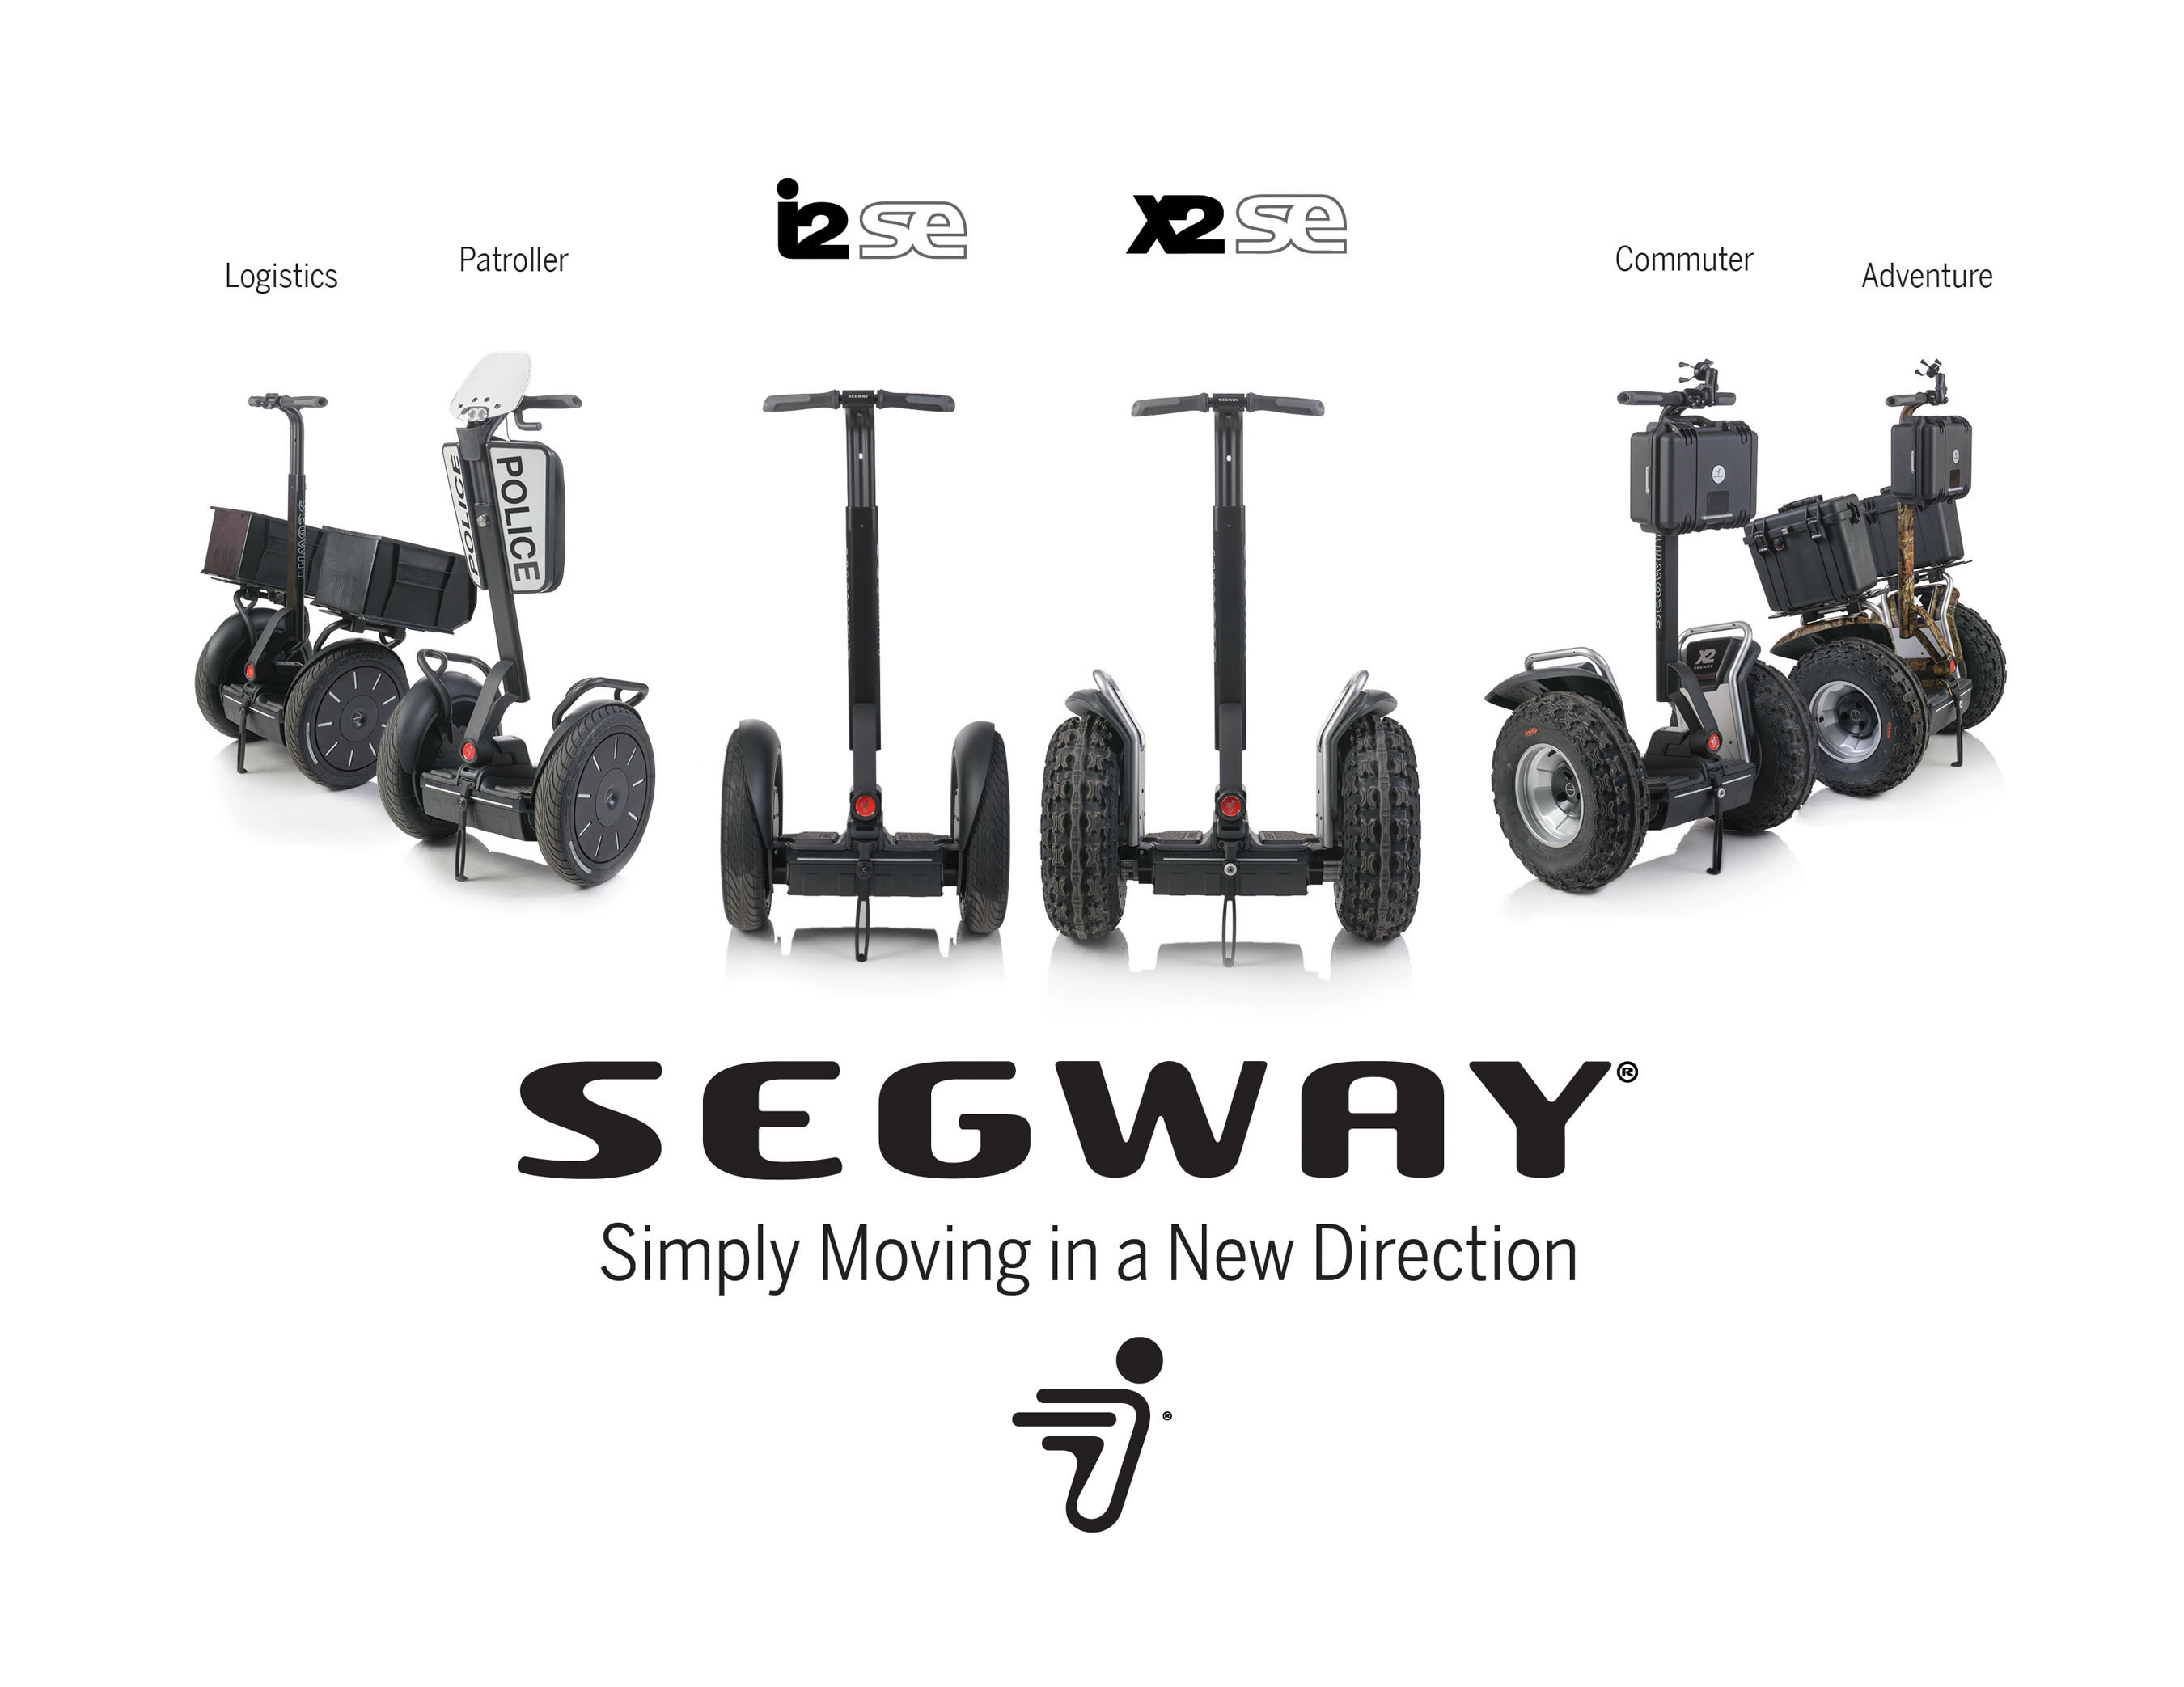 Segway Launches New PT Models and SegSolution Accessory Packages. (PRNewsFoto/Segway Inc.) (PRNewsFoto/SEGWAY INC.)